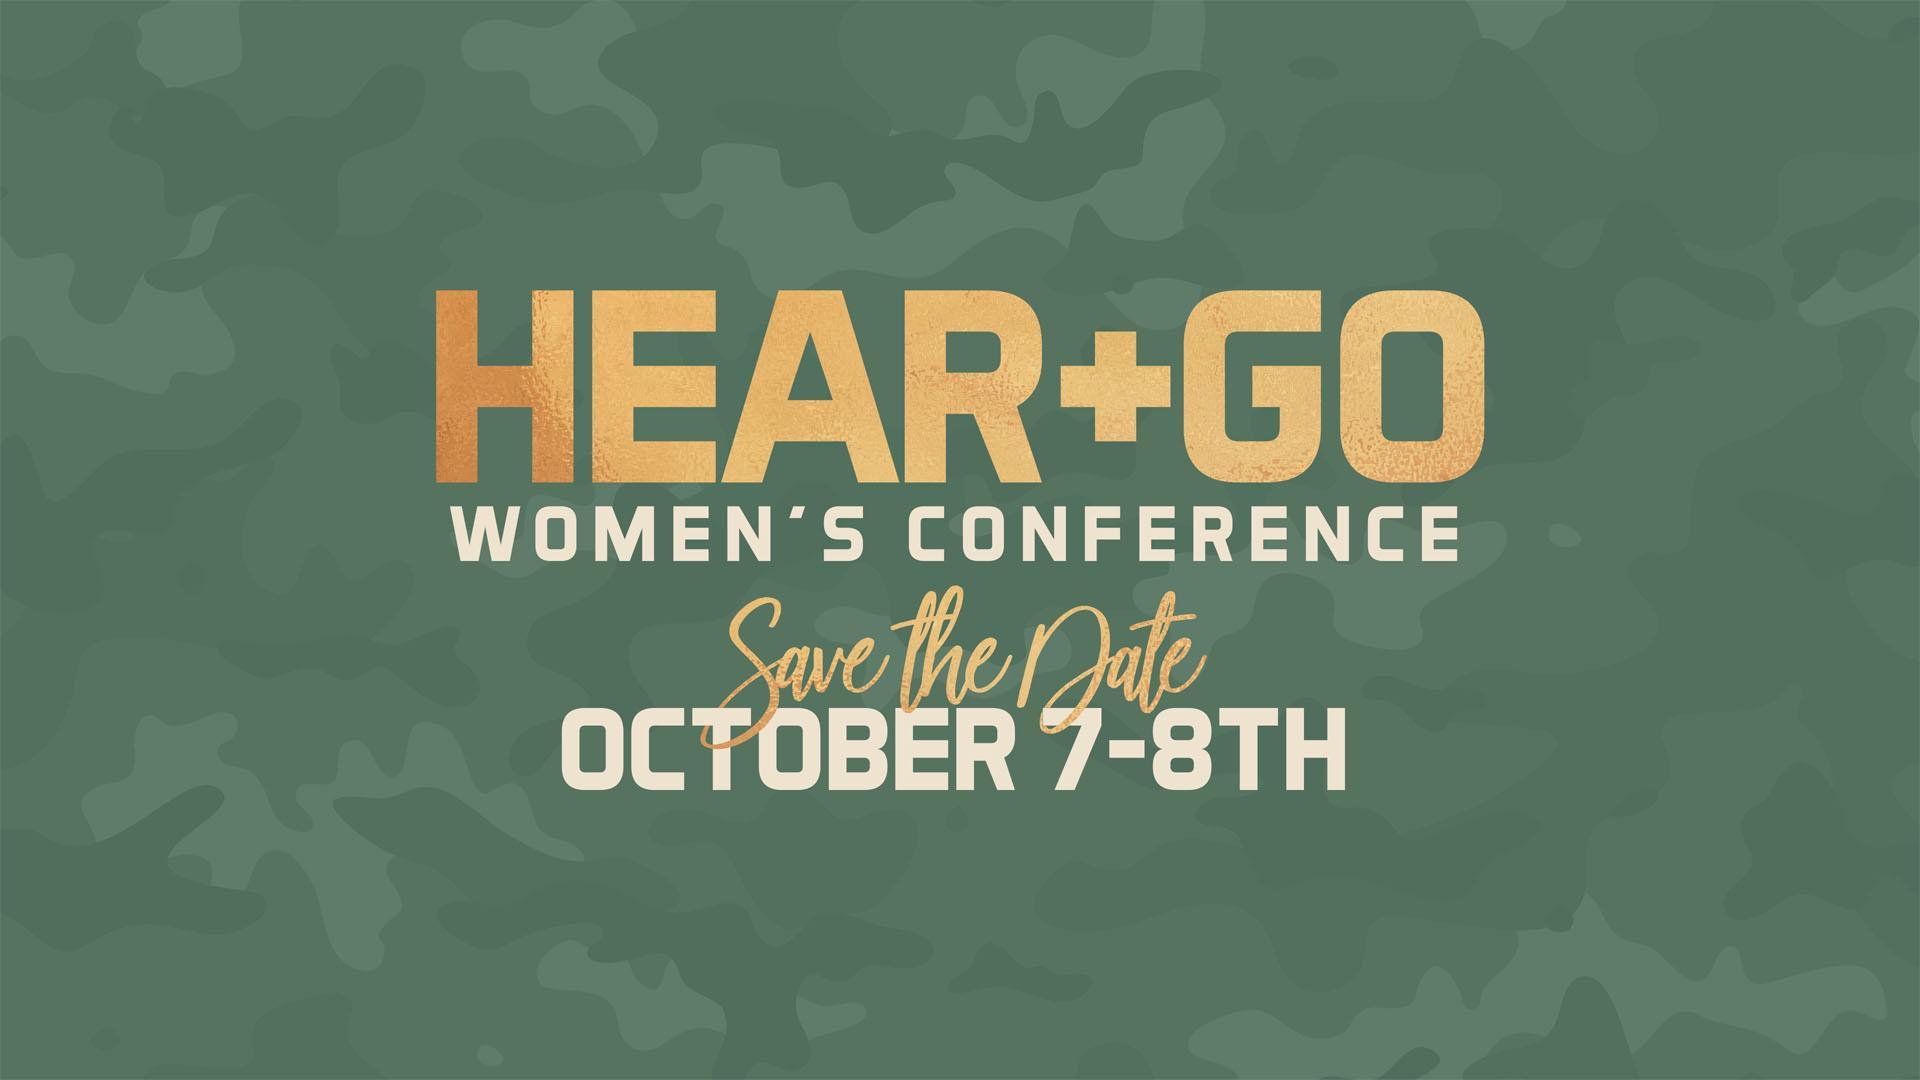 Hear + Go Women's Conference